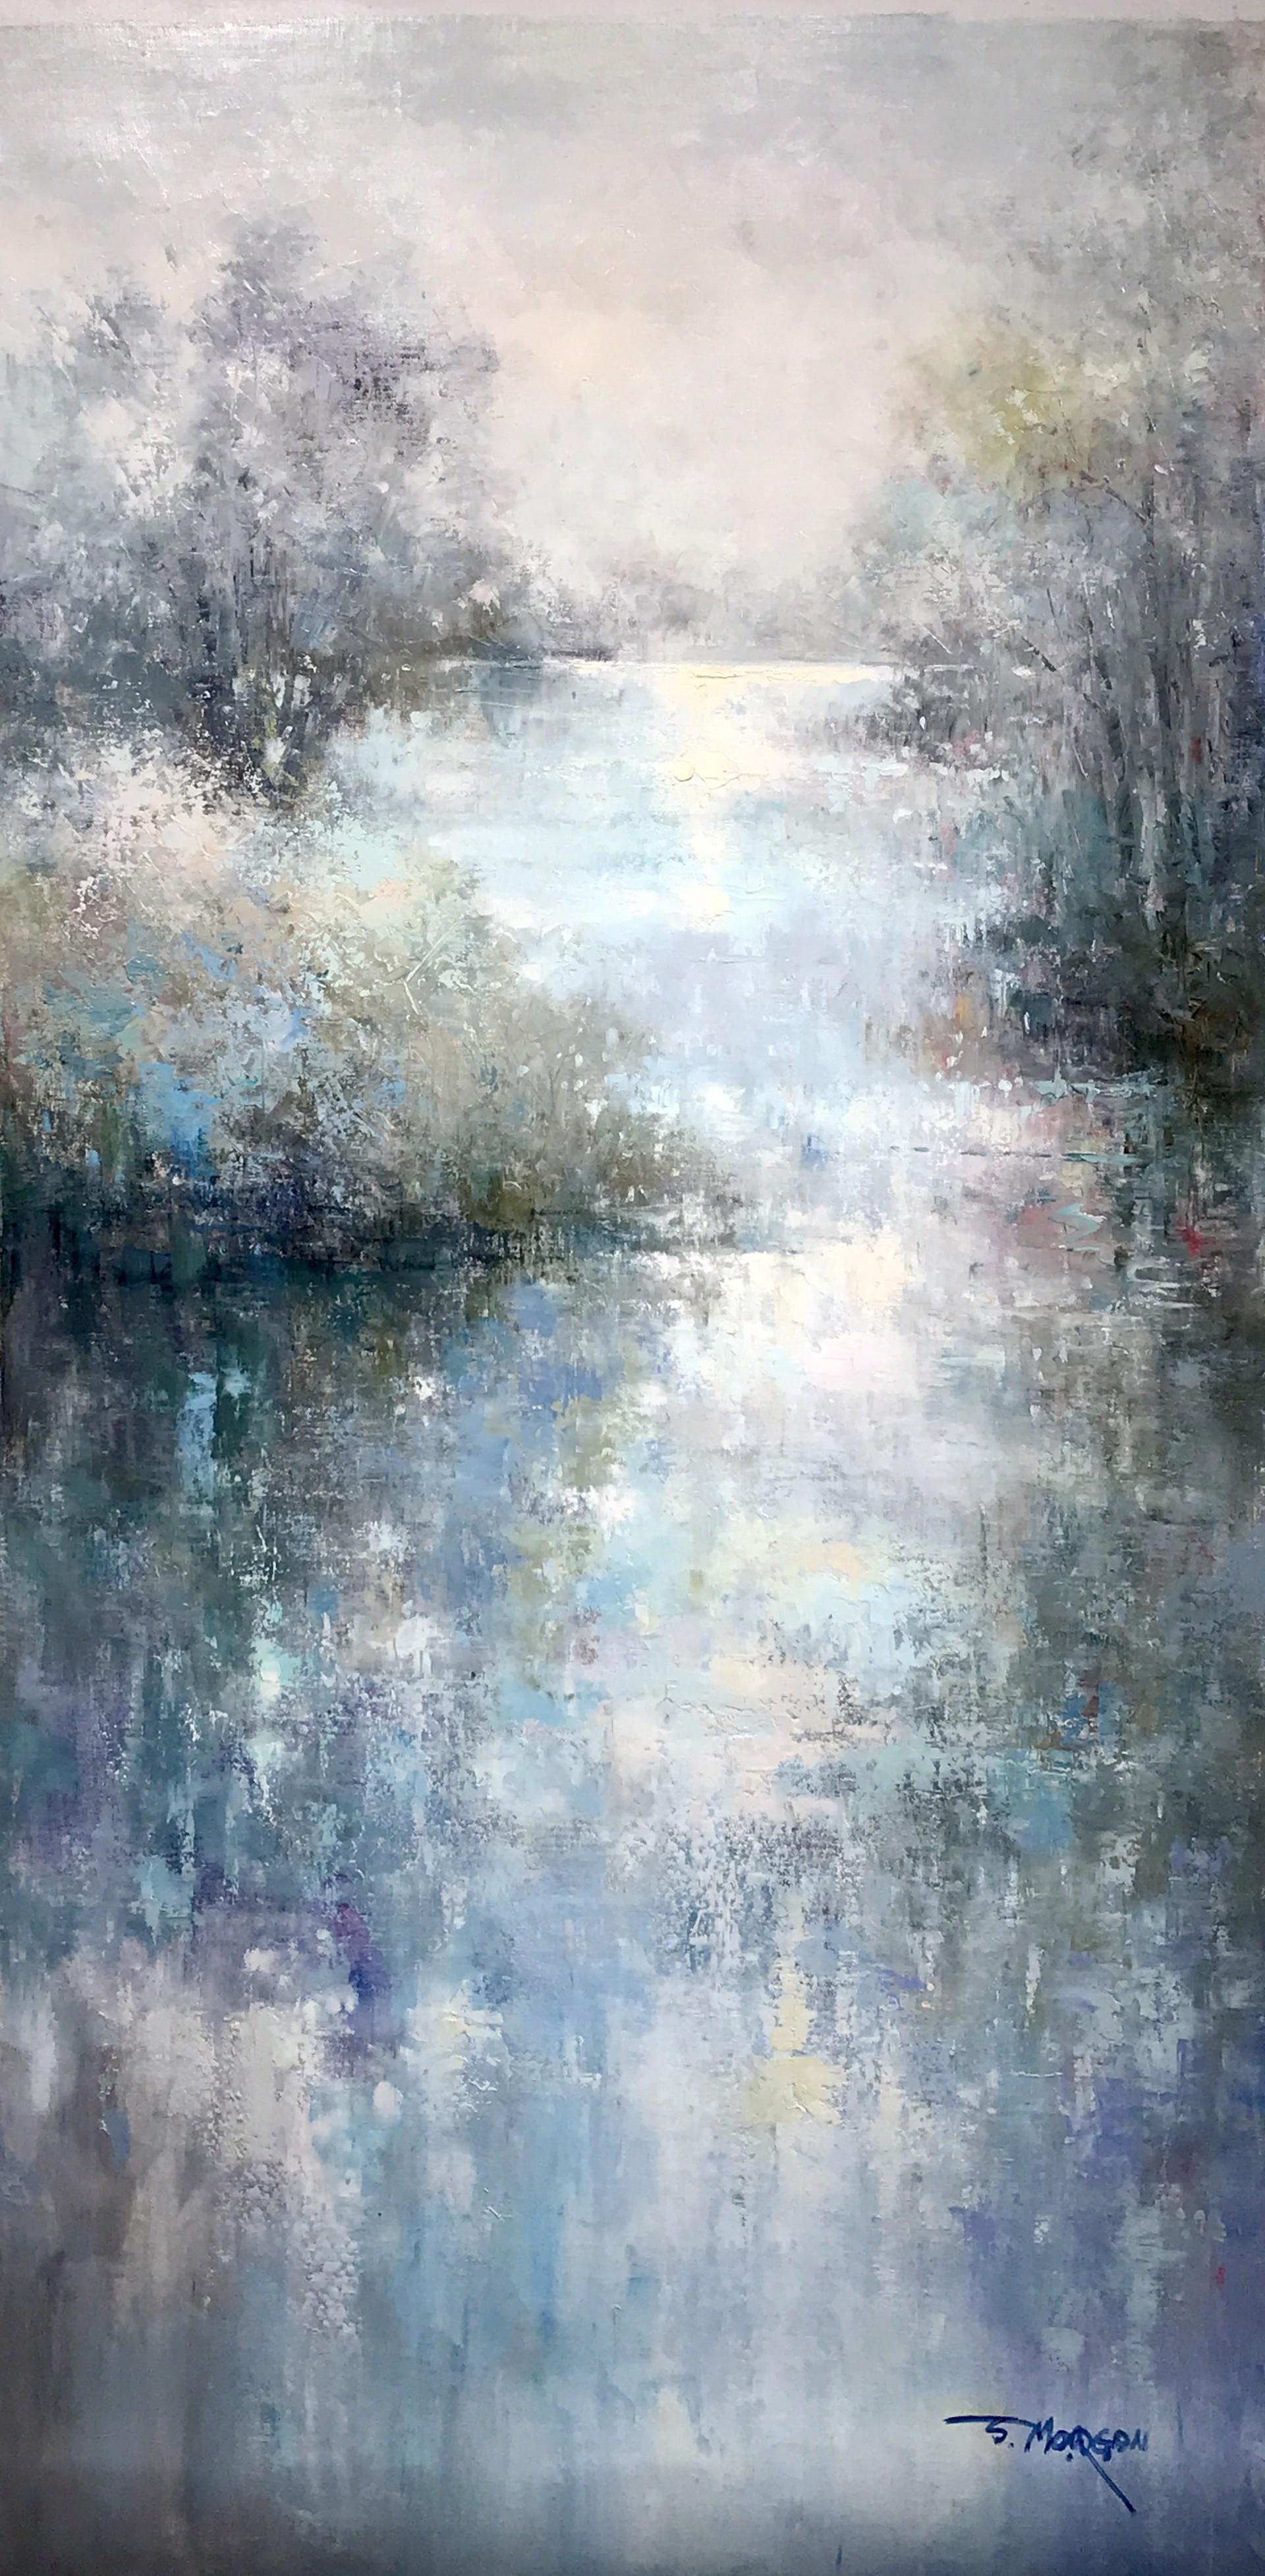 VERTICAL WATER SCENE by J MORGAN